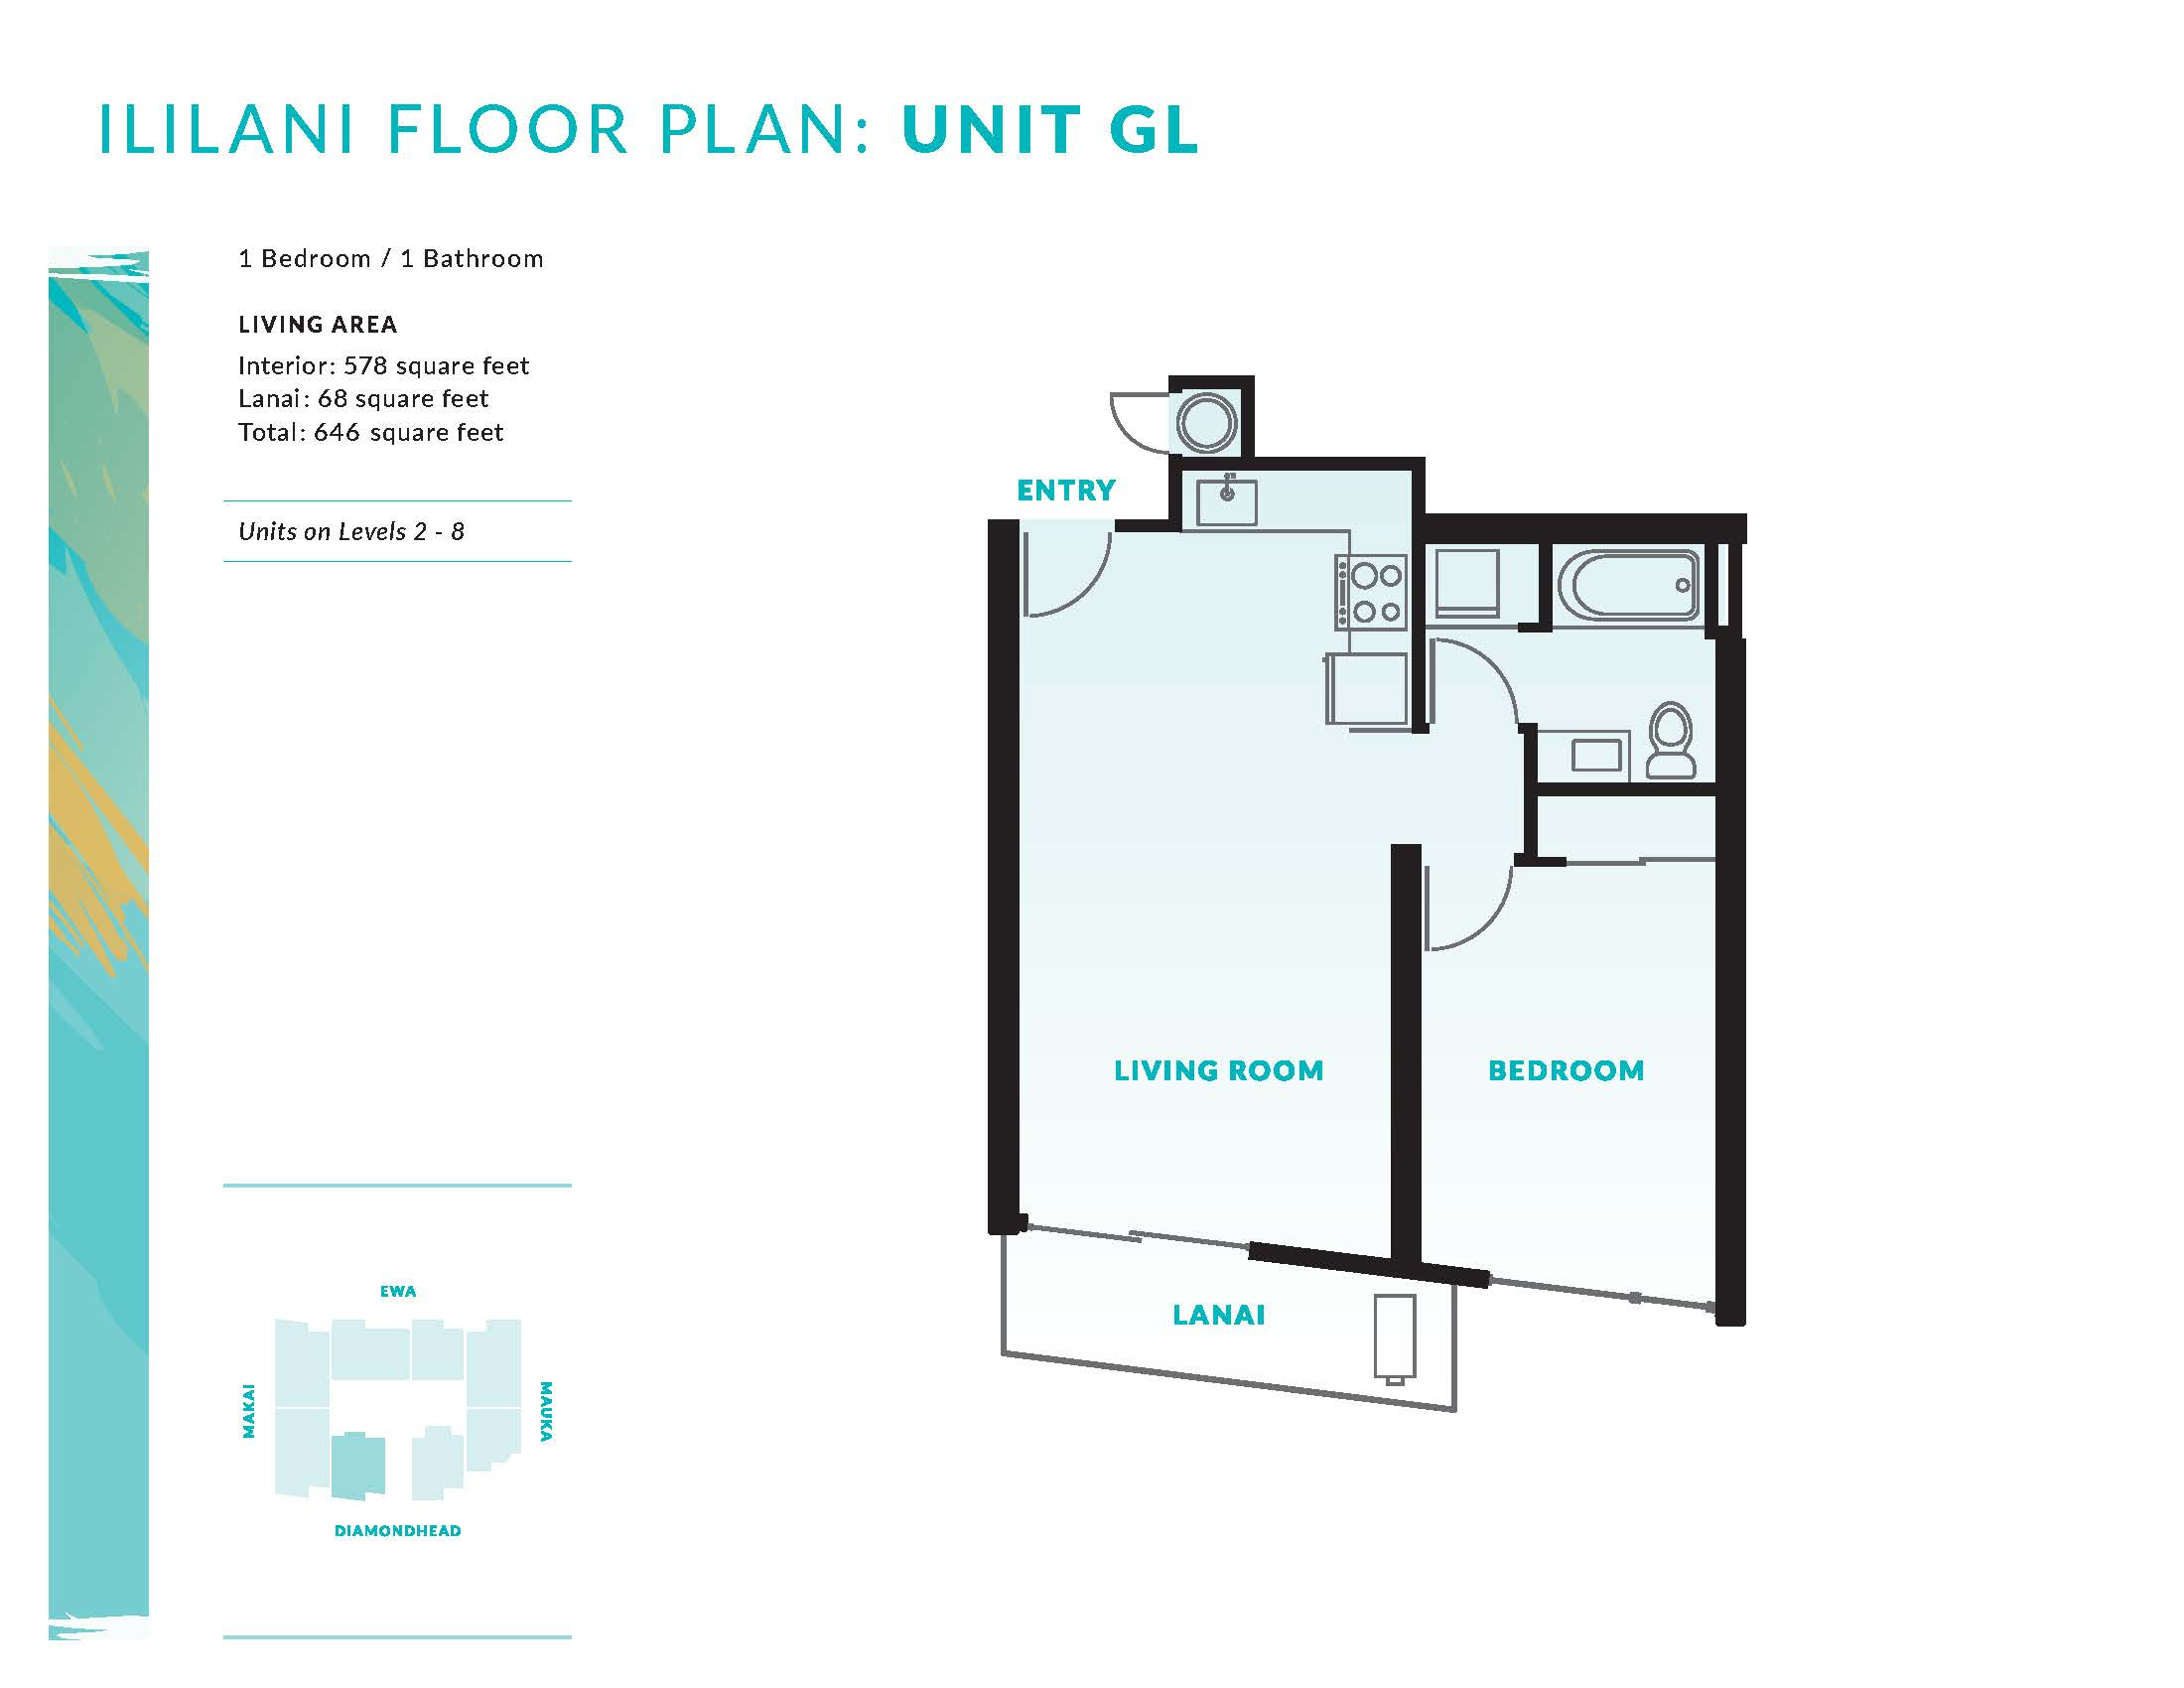 Ililani Floor Plan GL